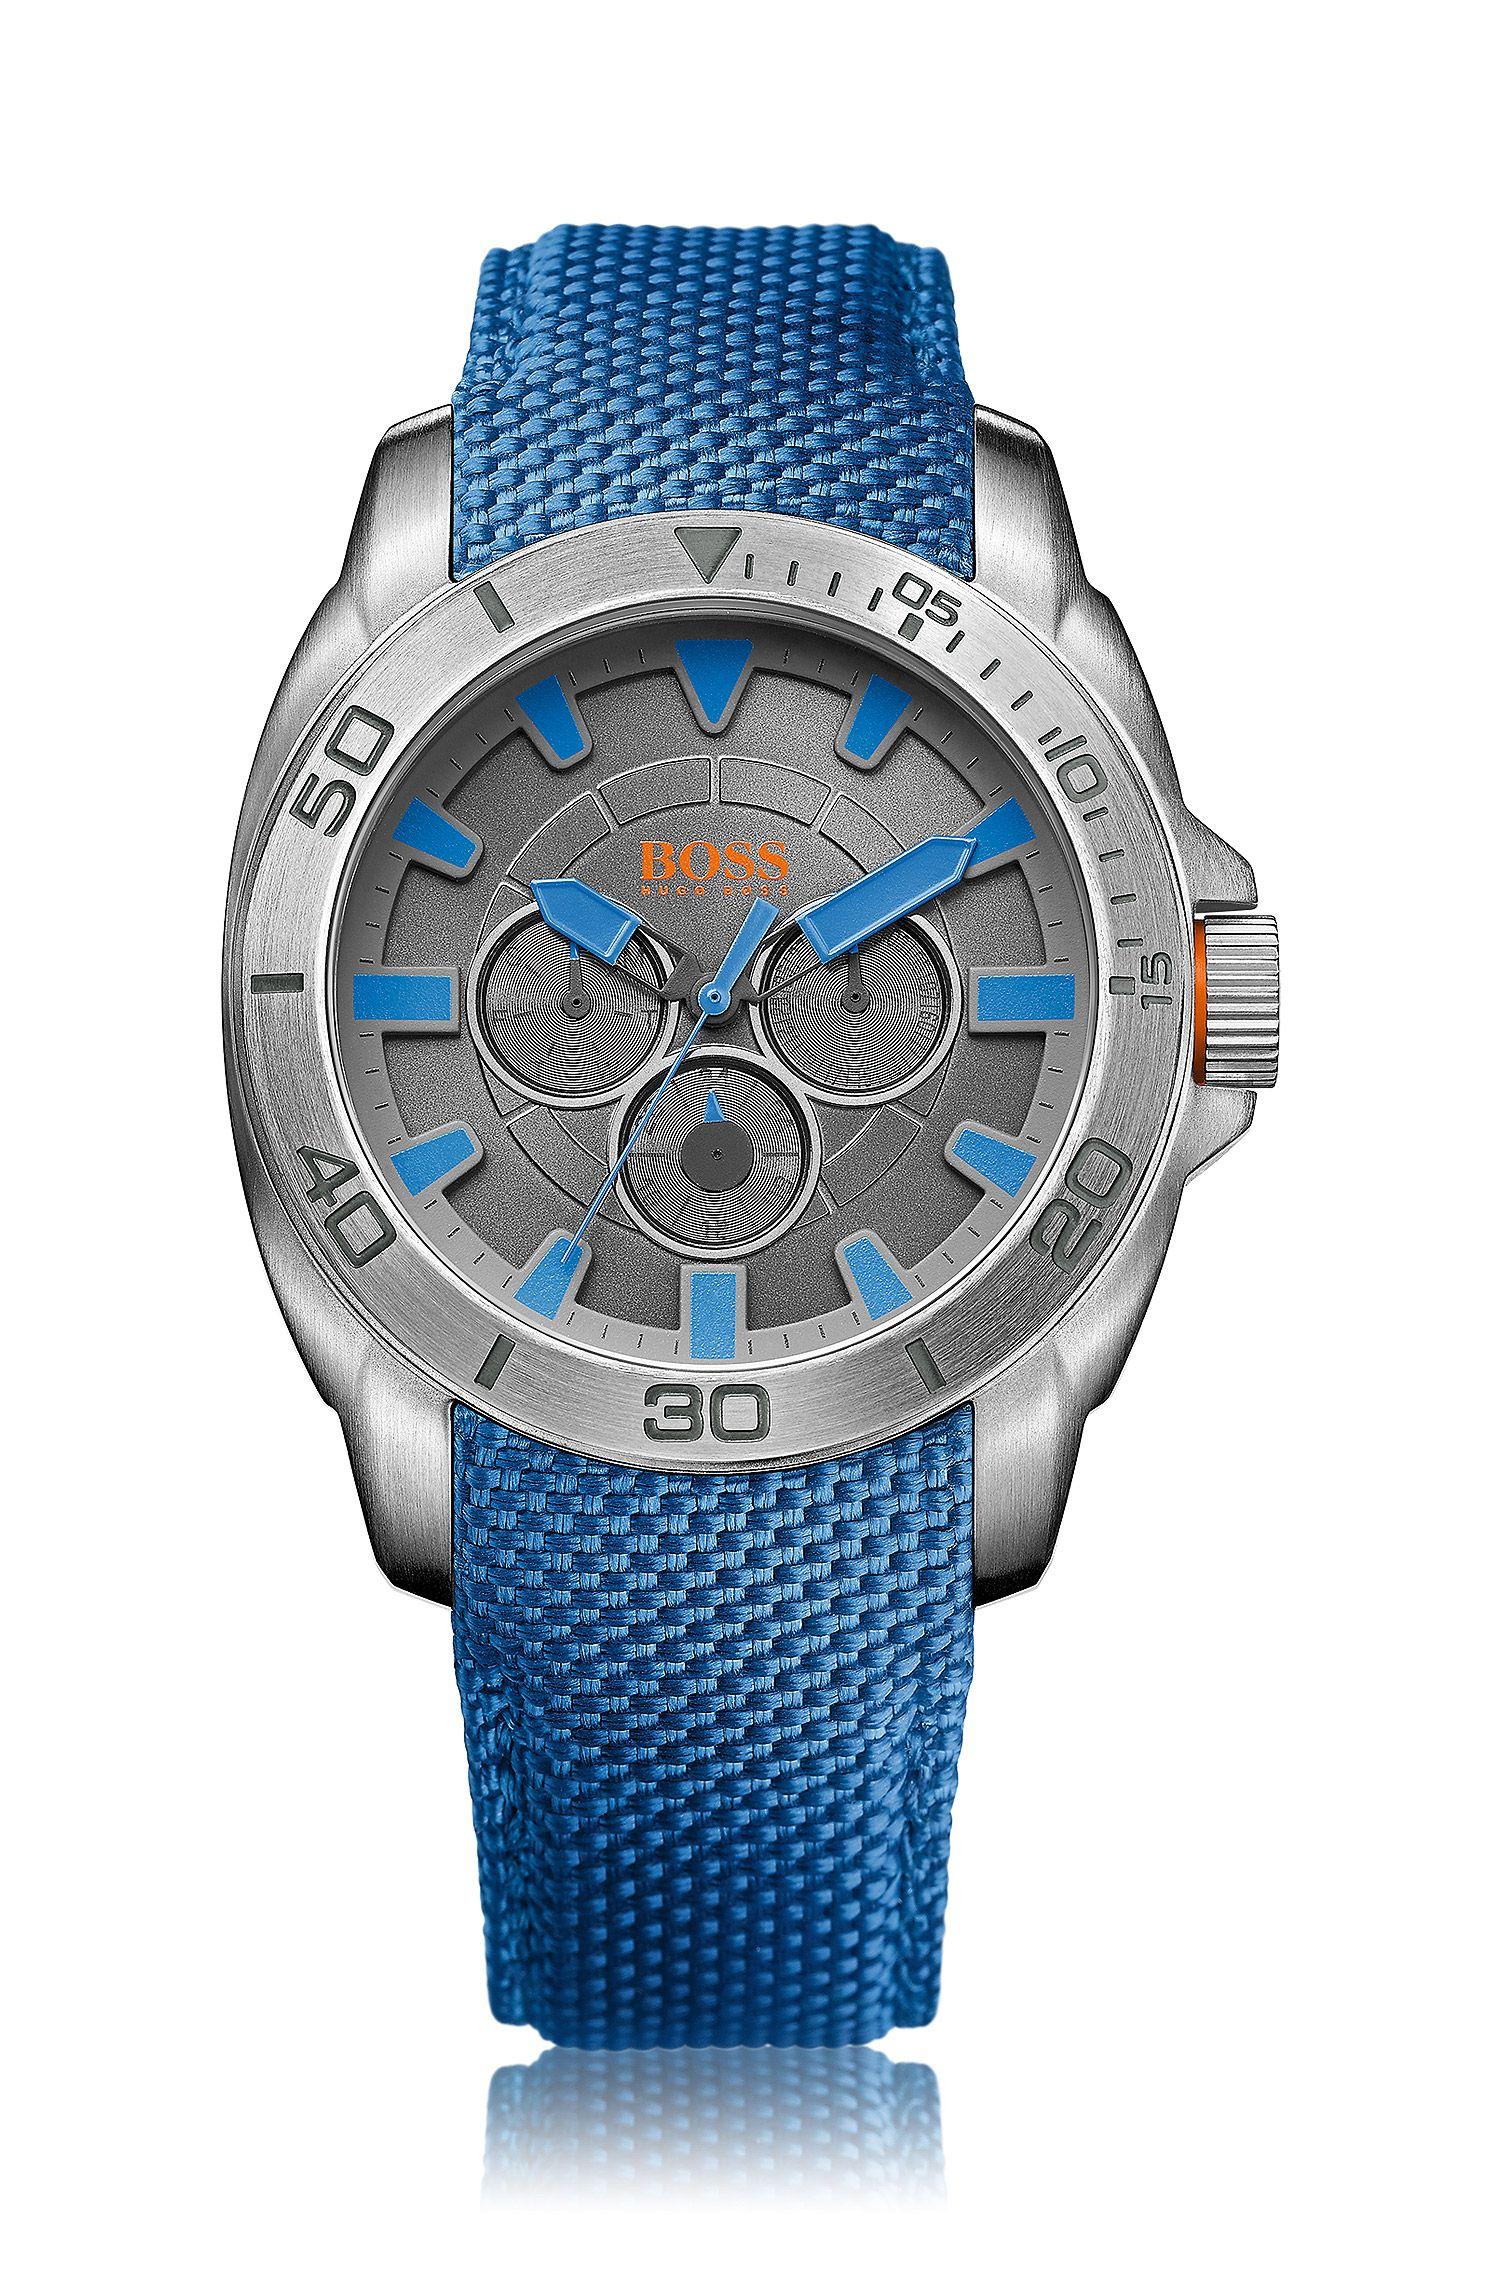 Montre-bracelet «HO7007» avec boîtier en acier inoxydable